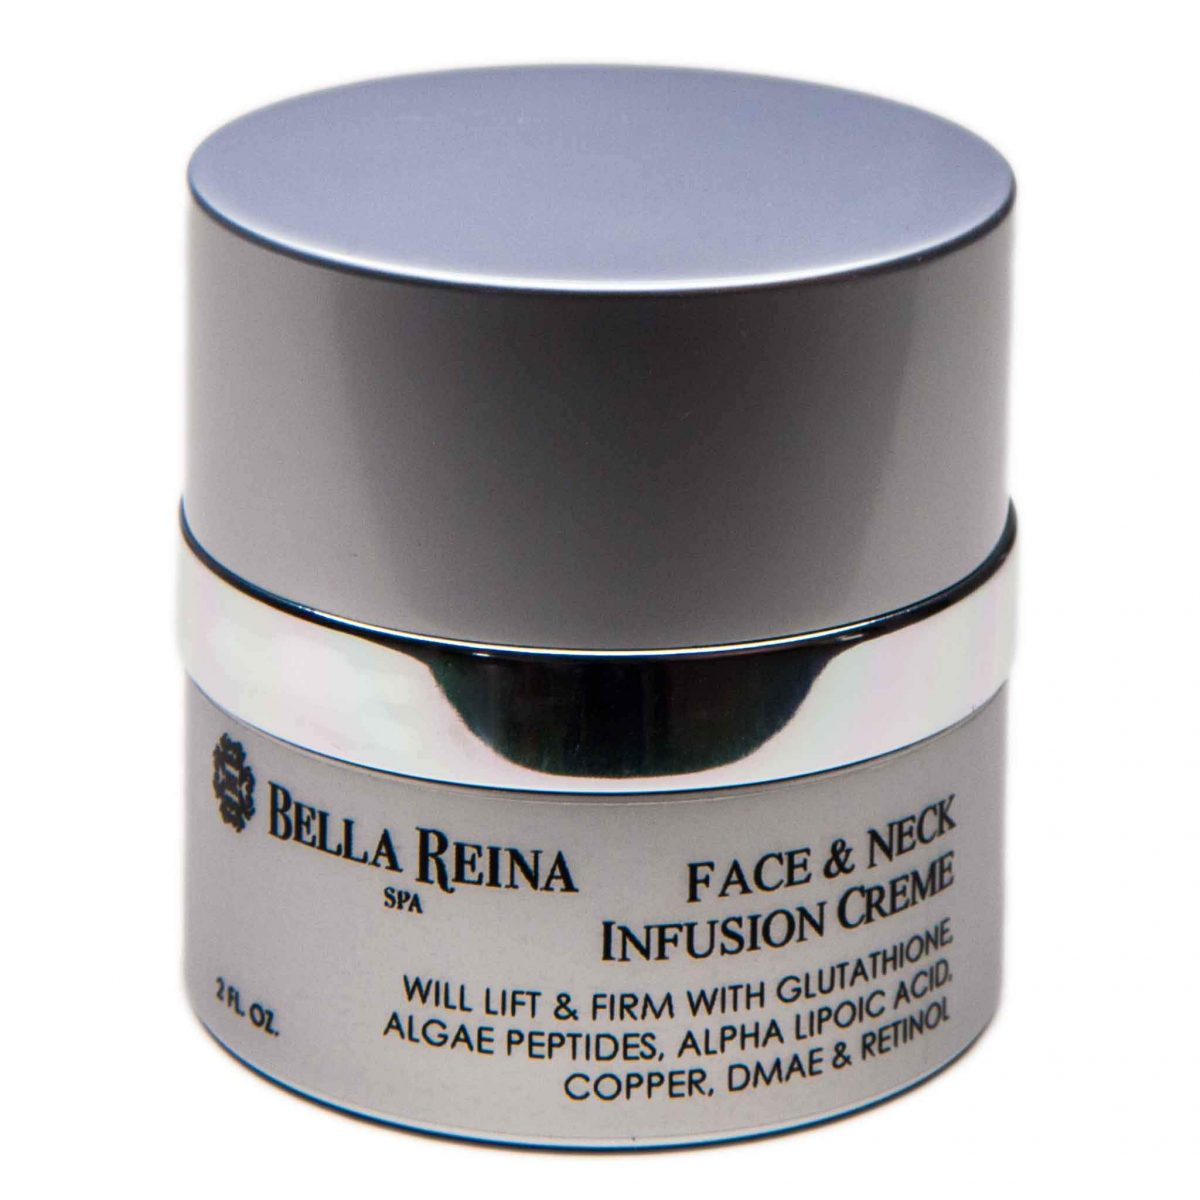 Bella Reina Skincare Face & Neck Anti-aging Infusion Crème Moisturizer (2oz)